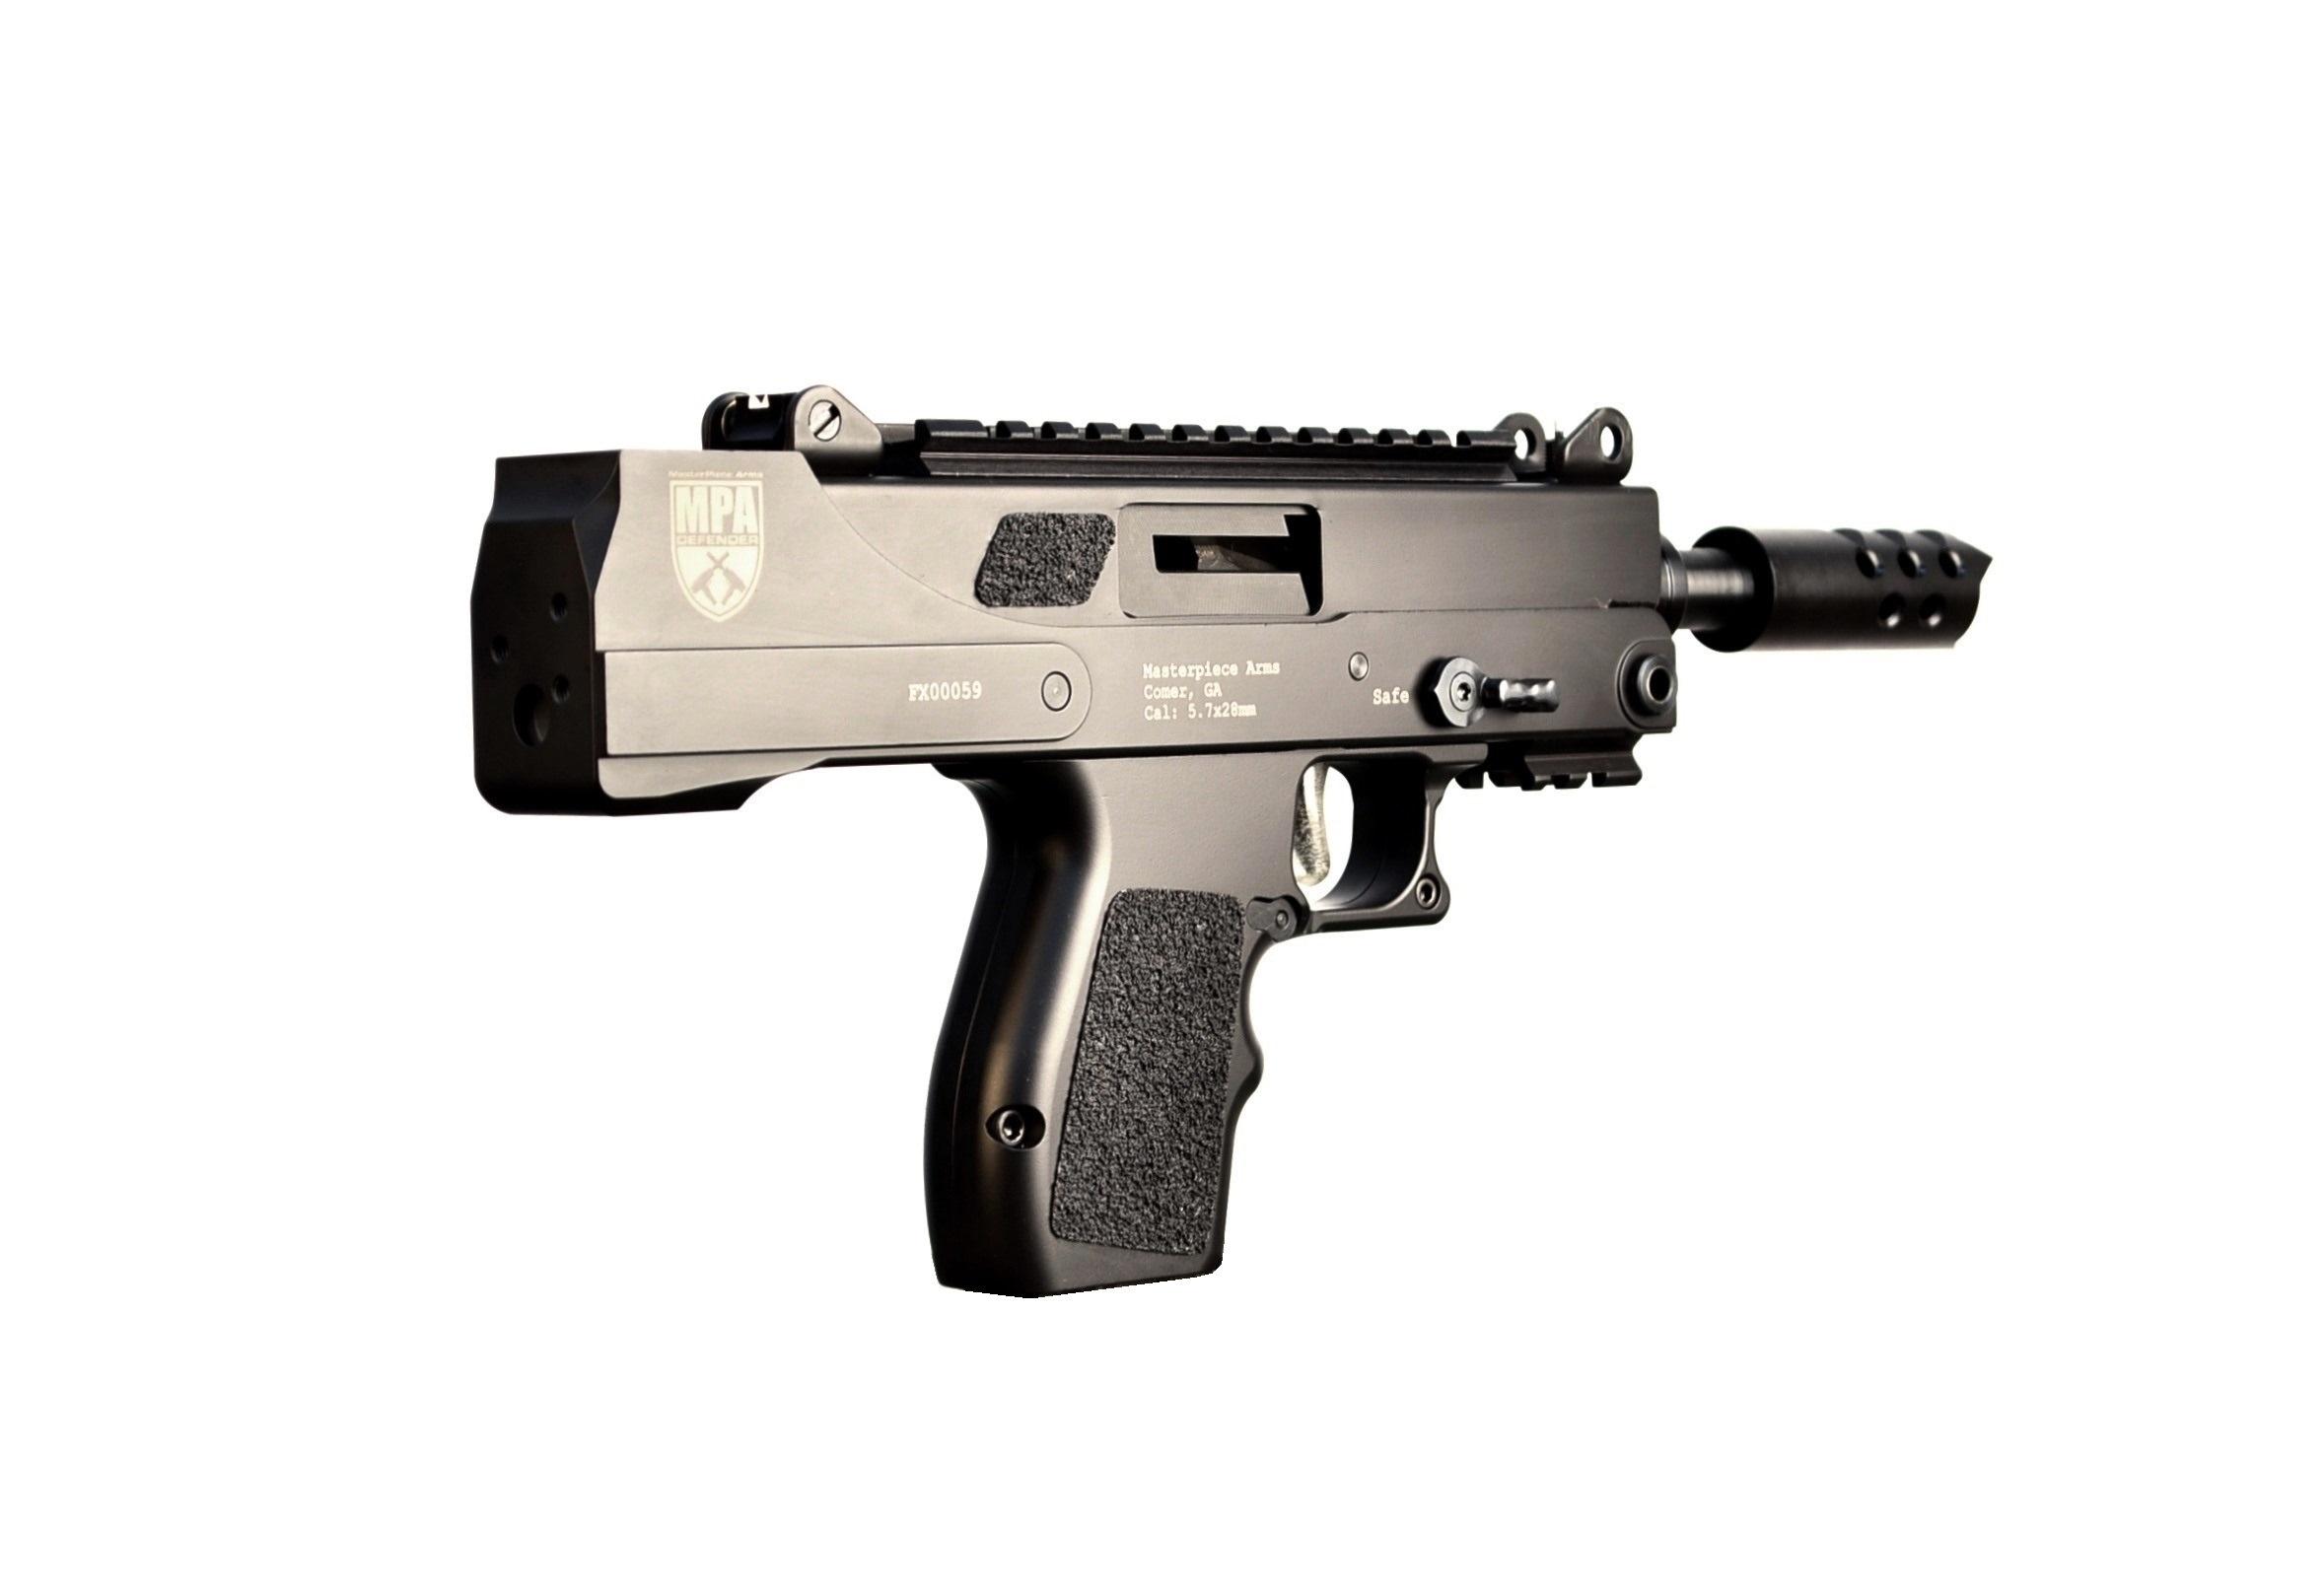 MPA57DMG 5 7x28mm Pistol - MasterPiece Arms, Inc